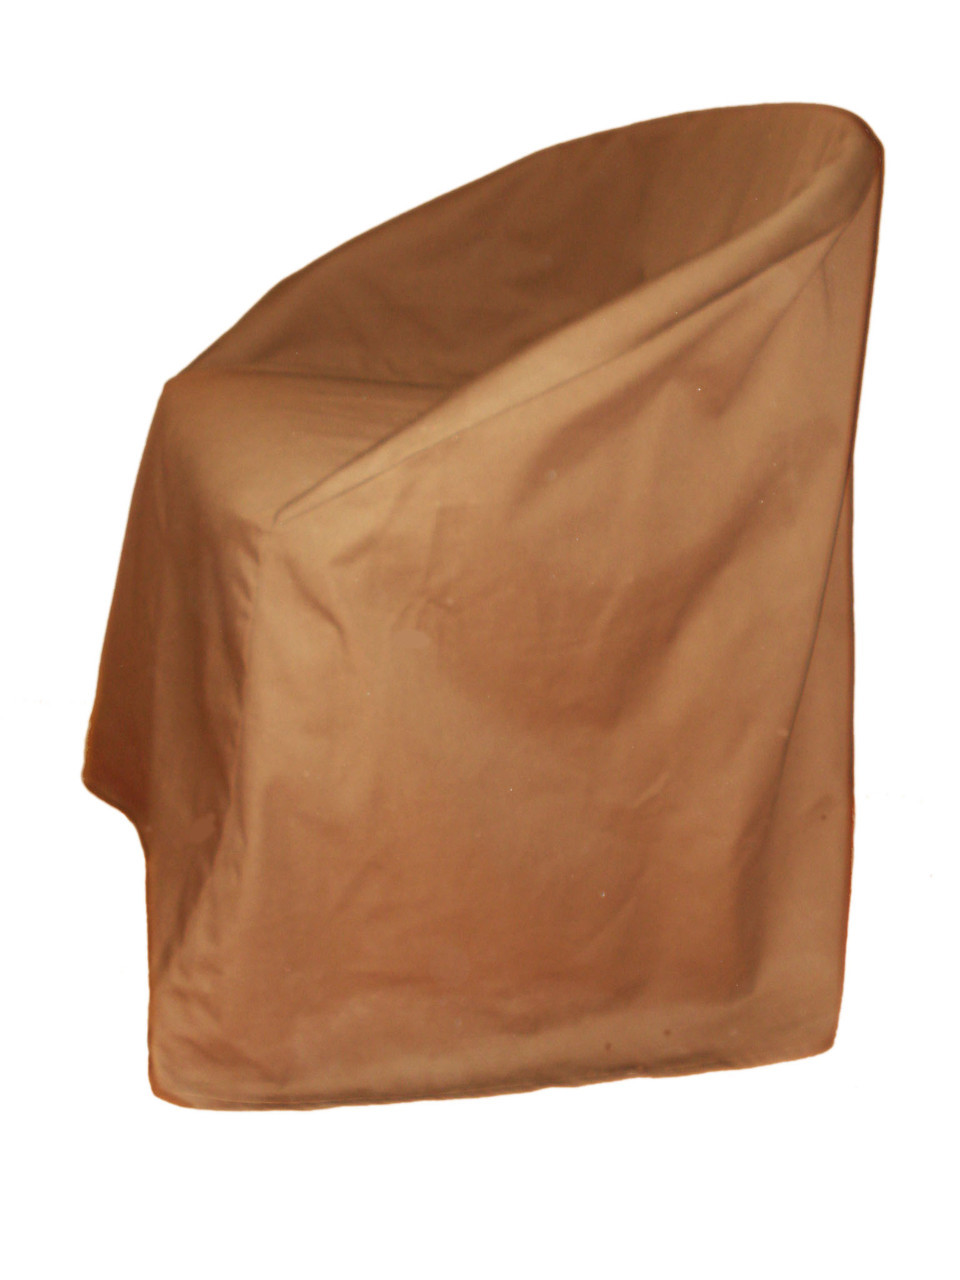 Чехол накидка на стул кресло коричневый Atteks - 1354